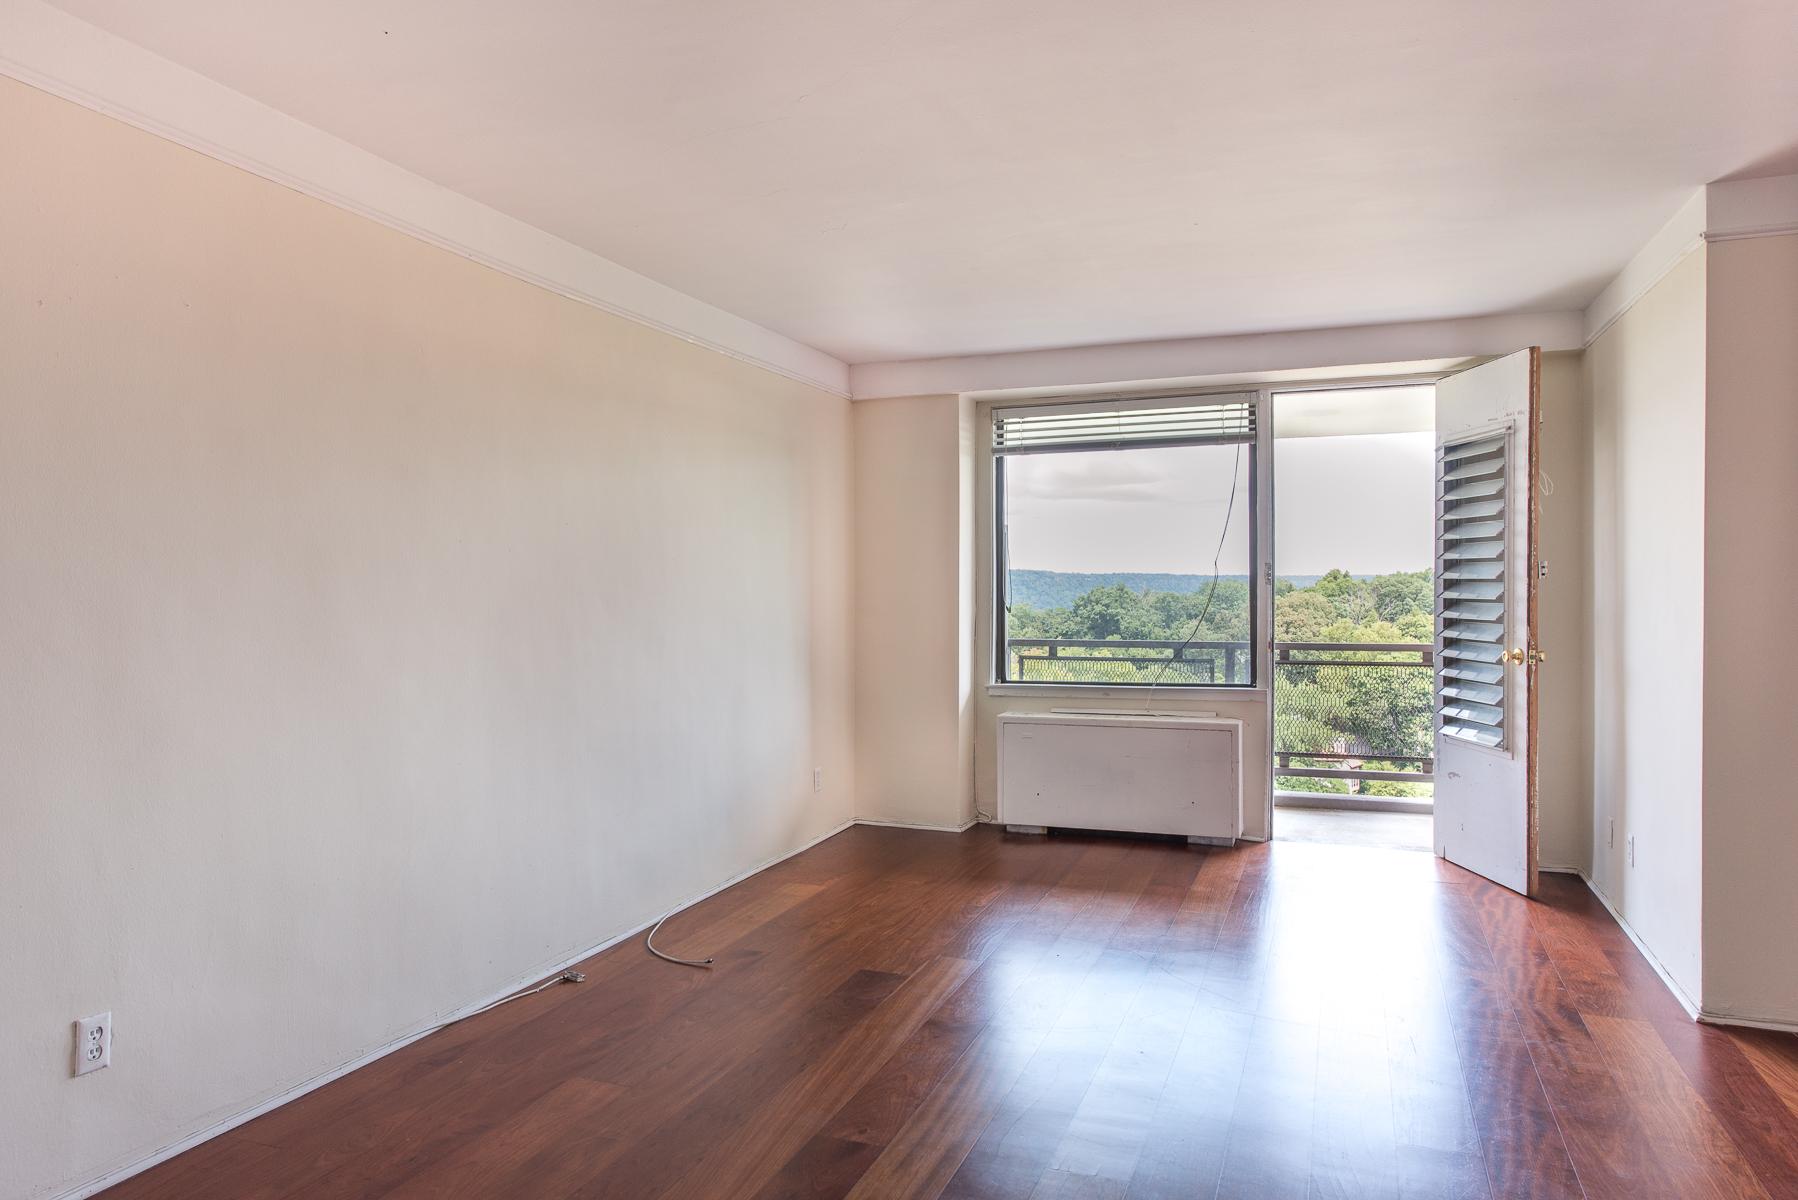 Кооперативная квартира для того Продажа на Sun-filled 3 BR with Terrace and River View 4705 Henry Hudson Parkway 11E Riverdale, Нью-Йорк 10471 Соединенные Штаты